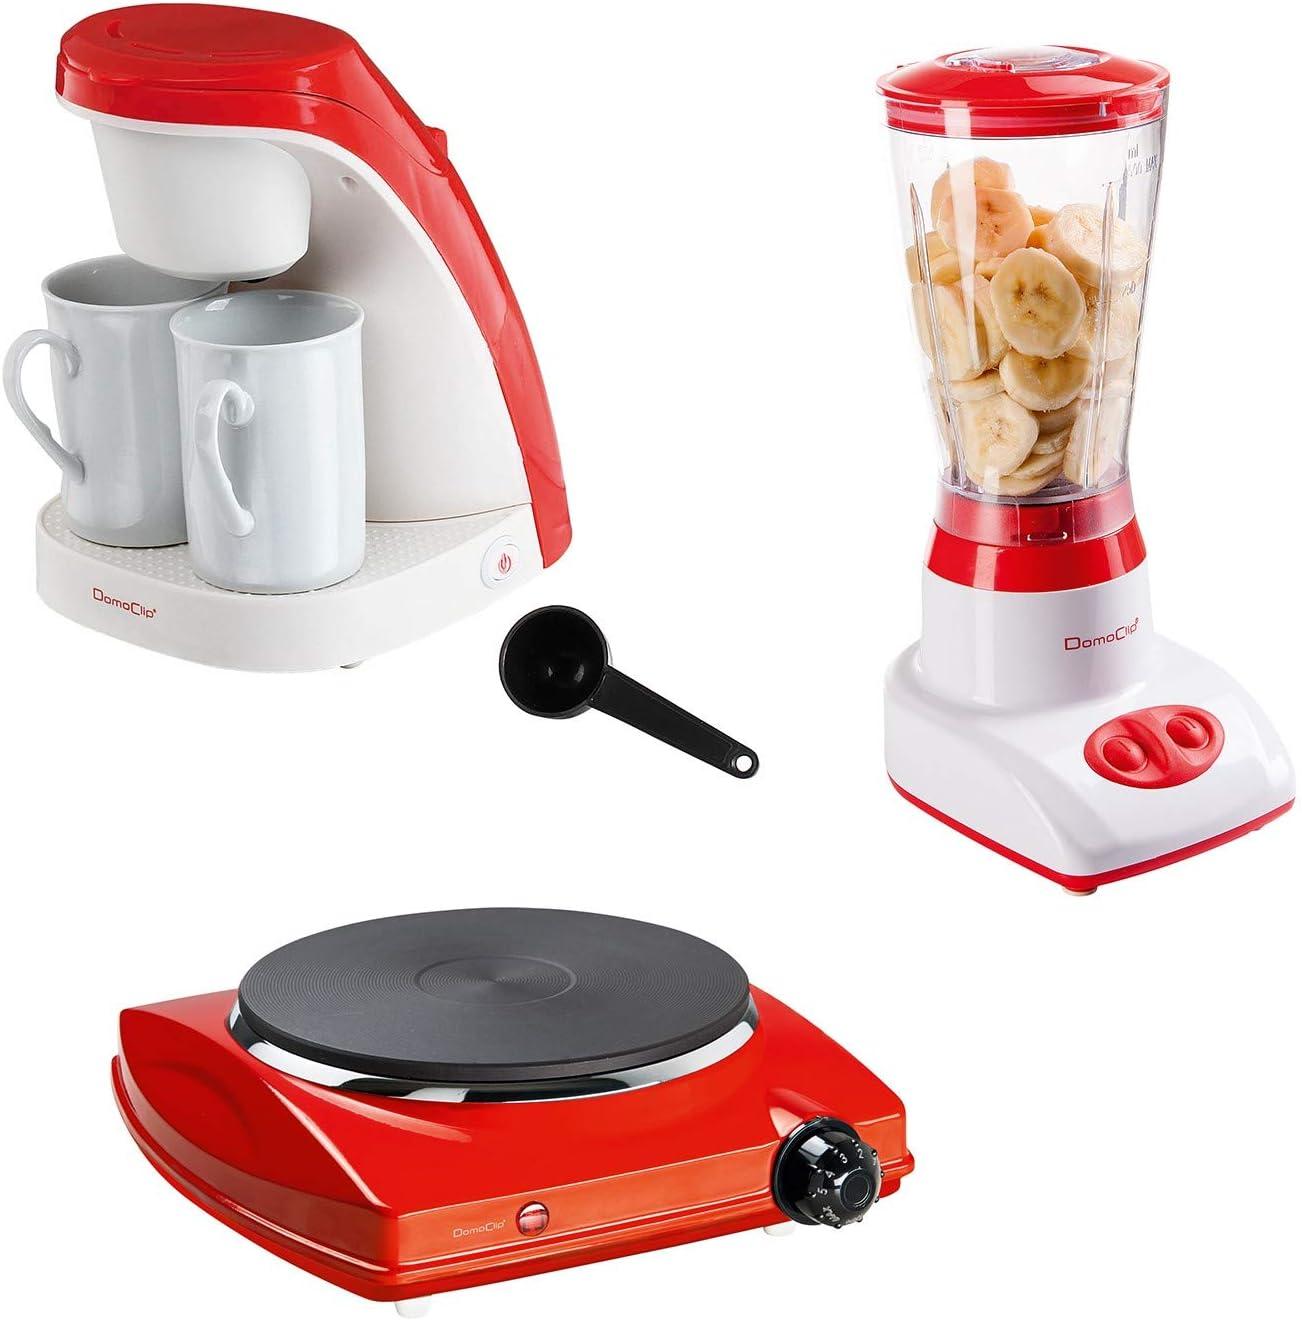 Cafetera eléctrica + batidora licuadora + placa de horno rojo 1 ...